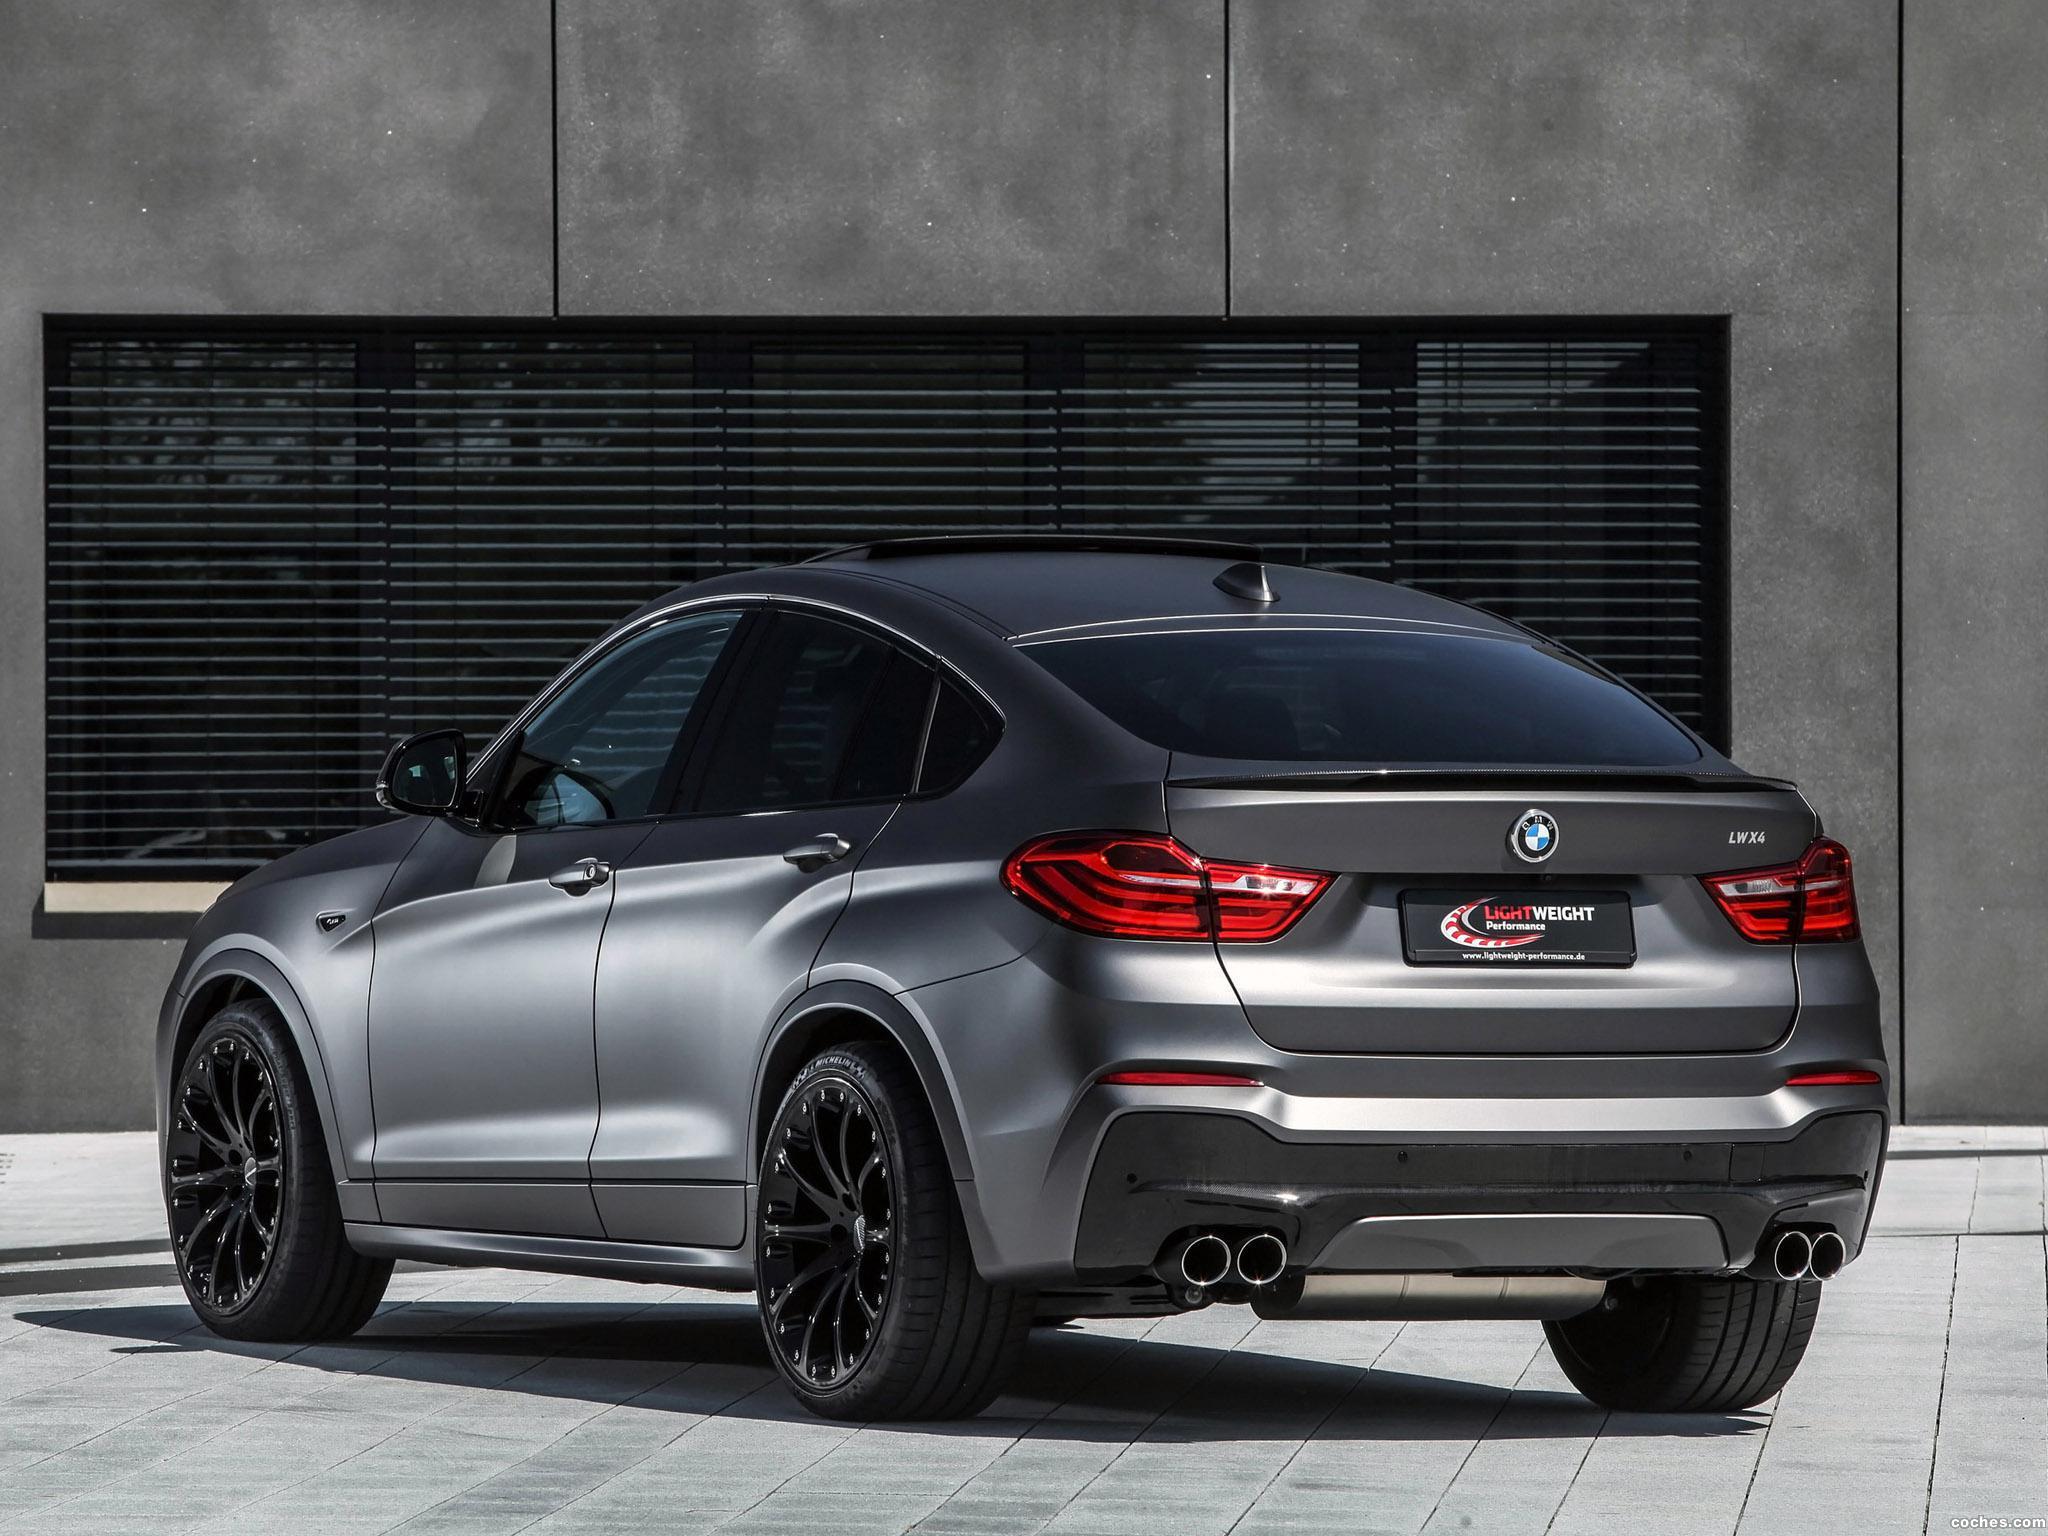 Foto 6 de BMW X4 Lightweight Performance F26 2015